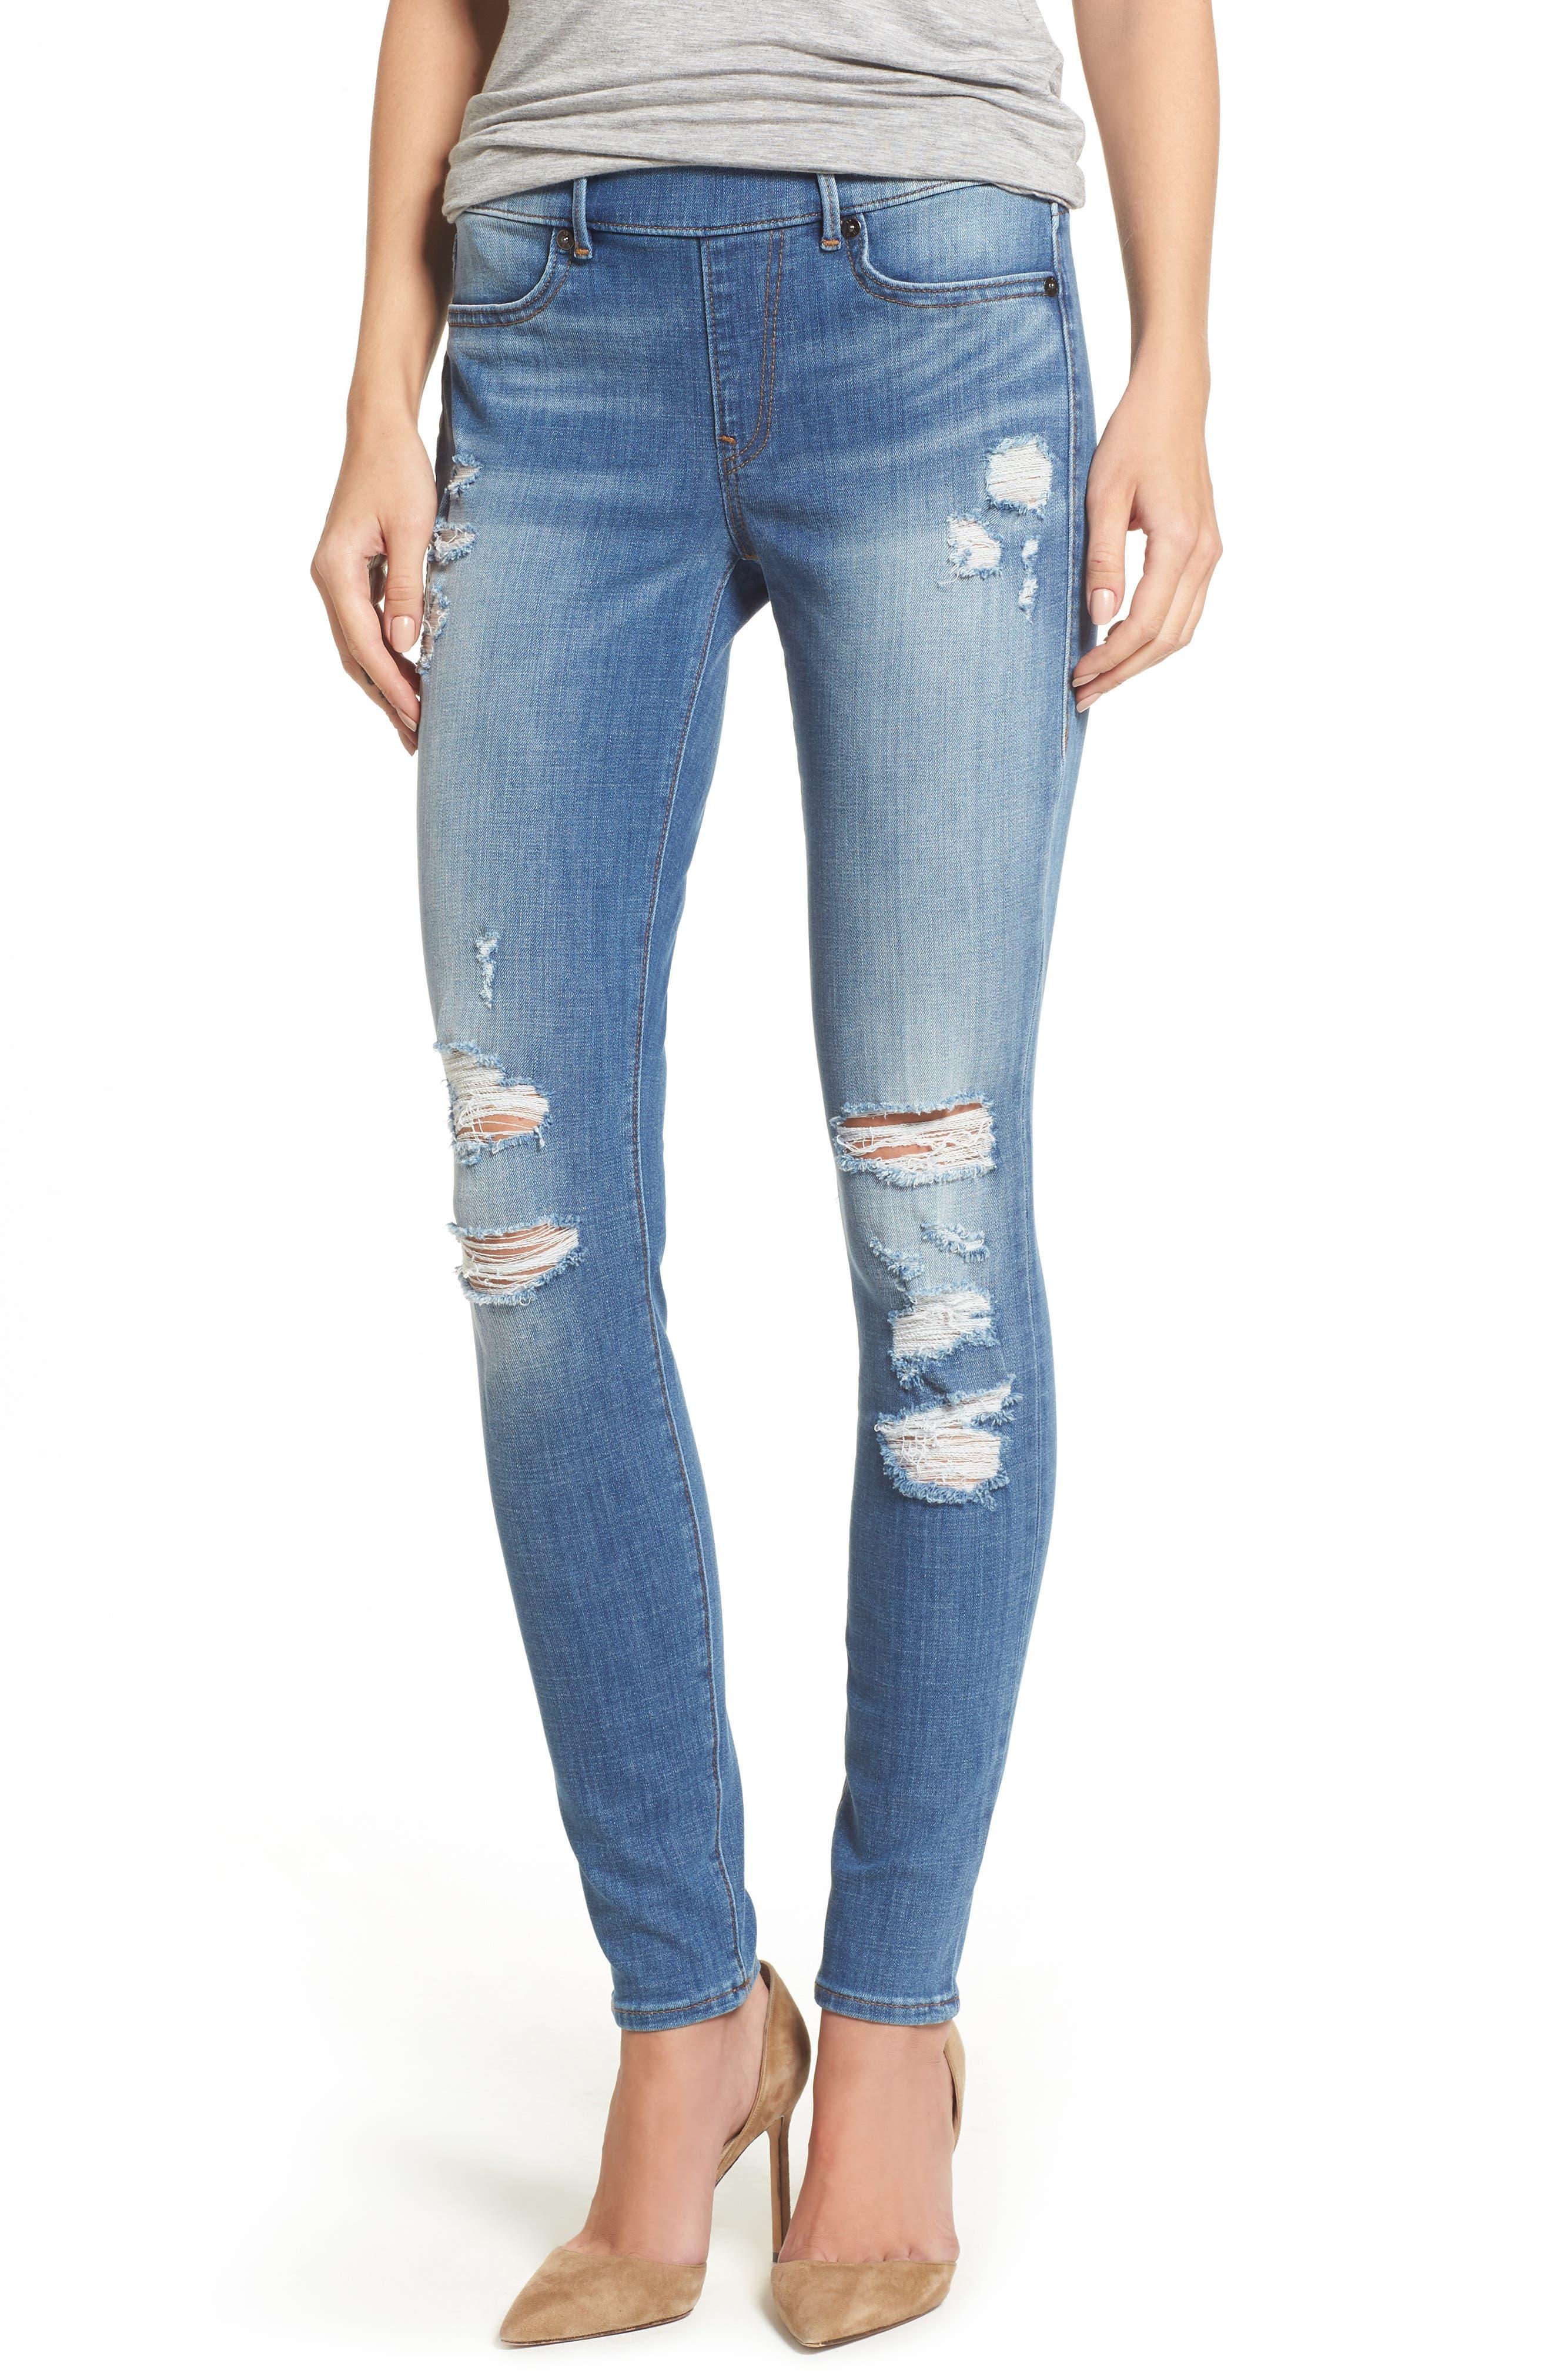 Jennie Runway Curvy Skinny Jeans,                         Main,                         color, 400